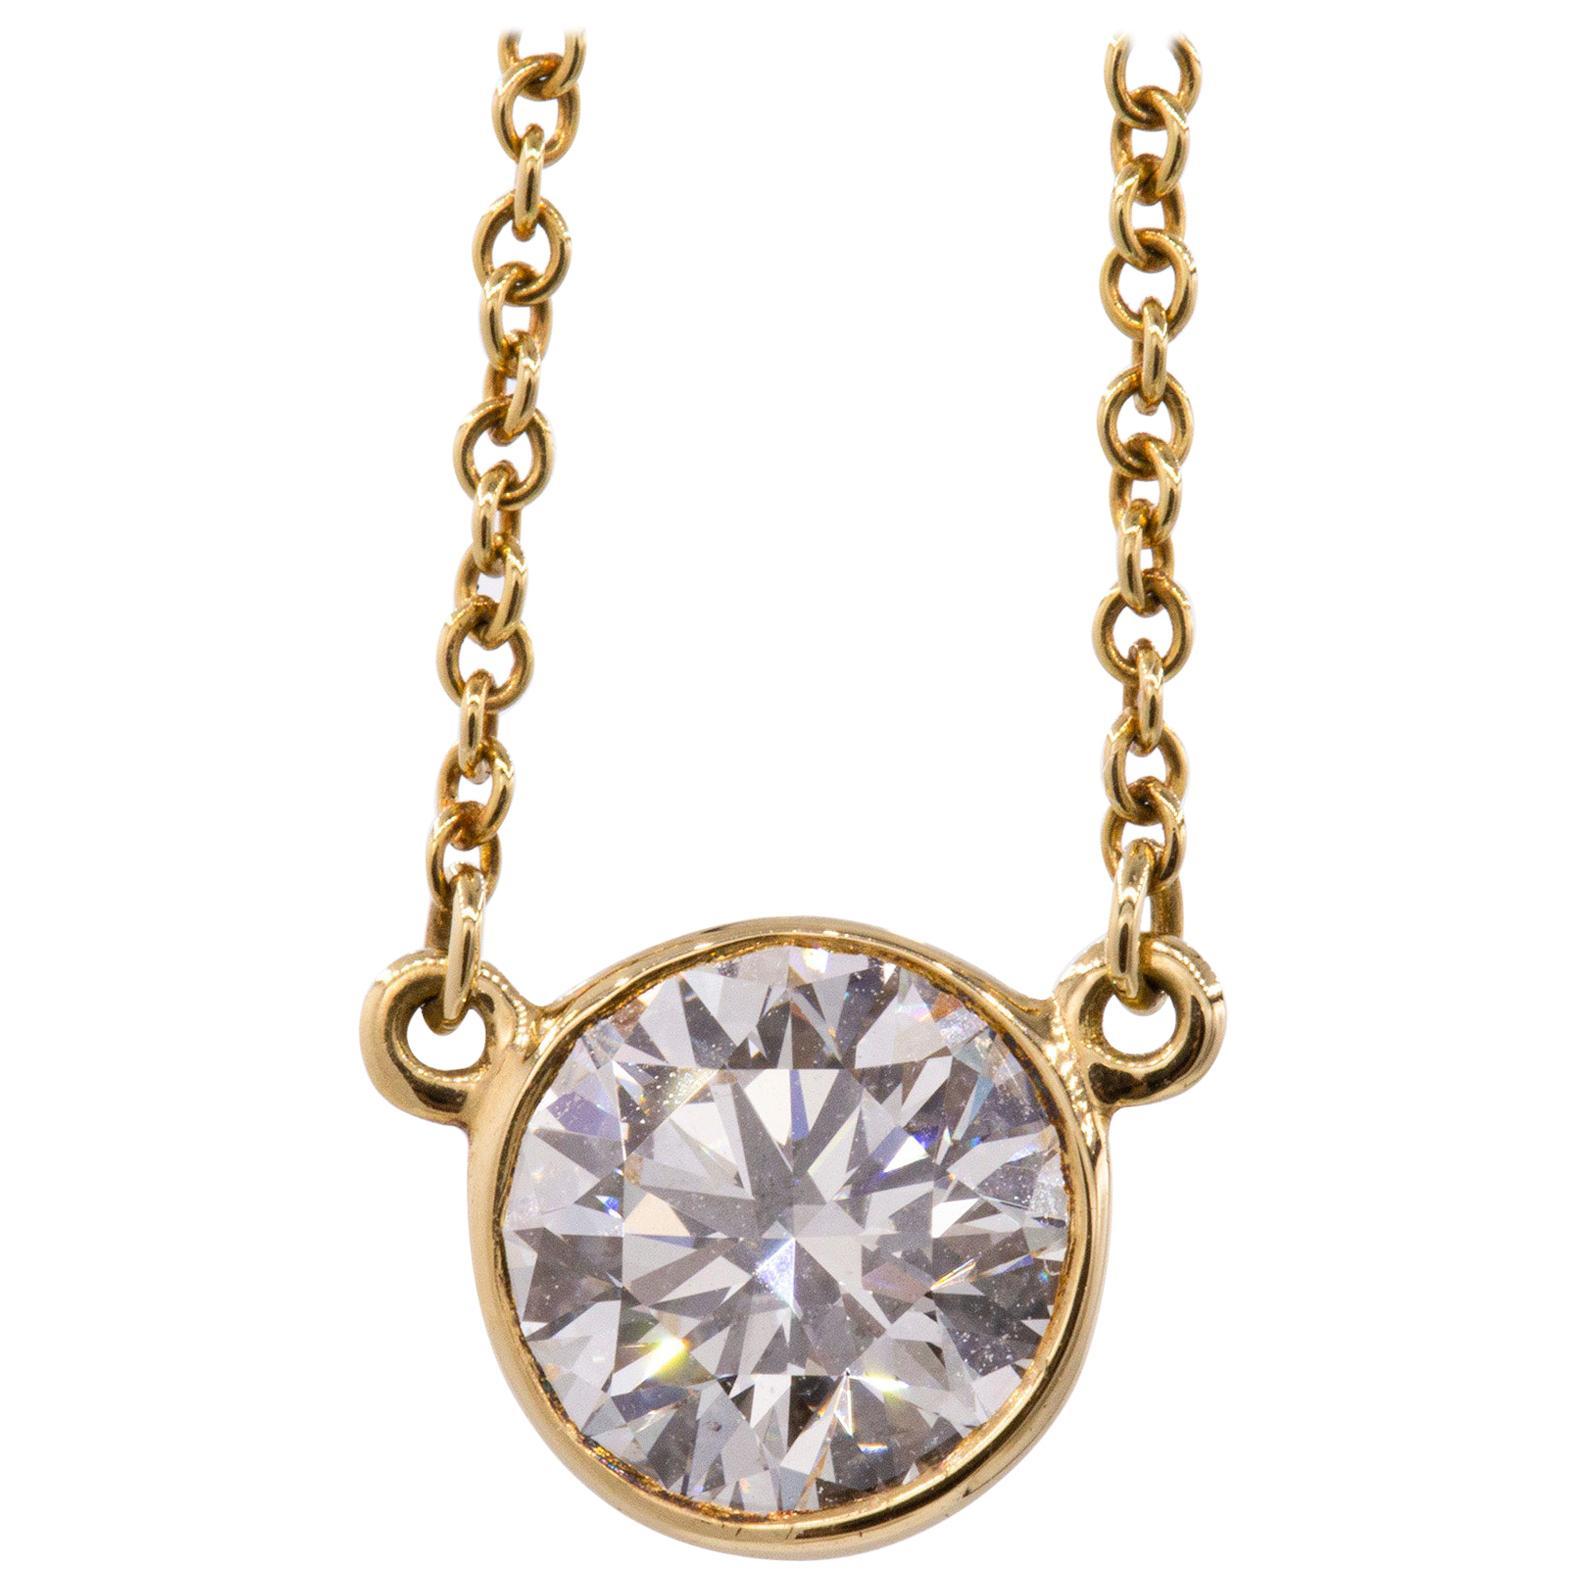 Tiffany & Co Elsa Peretti Diamond Pendant